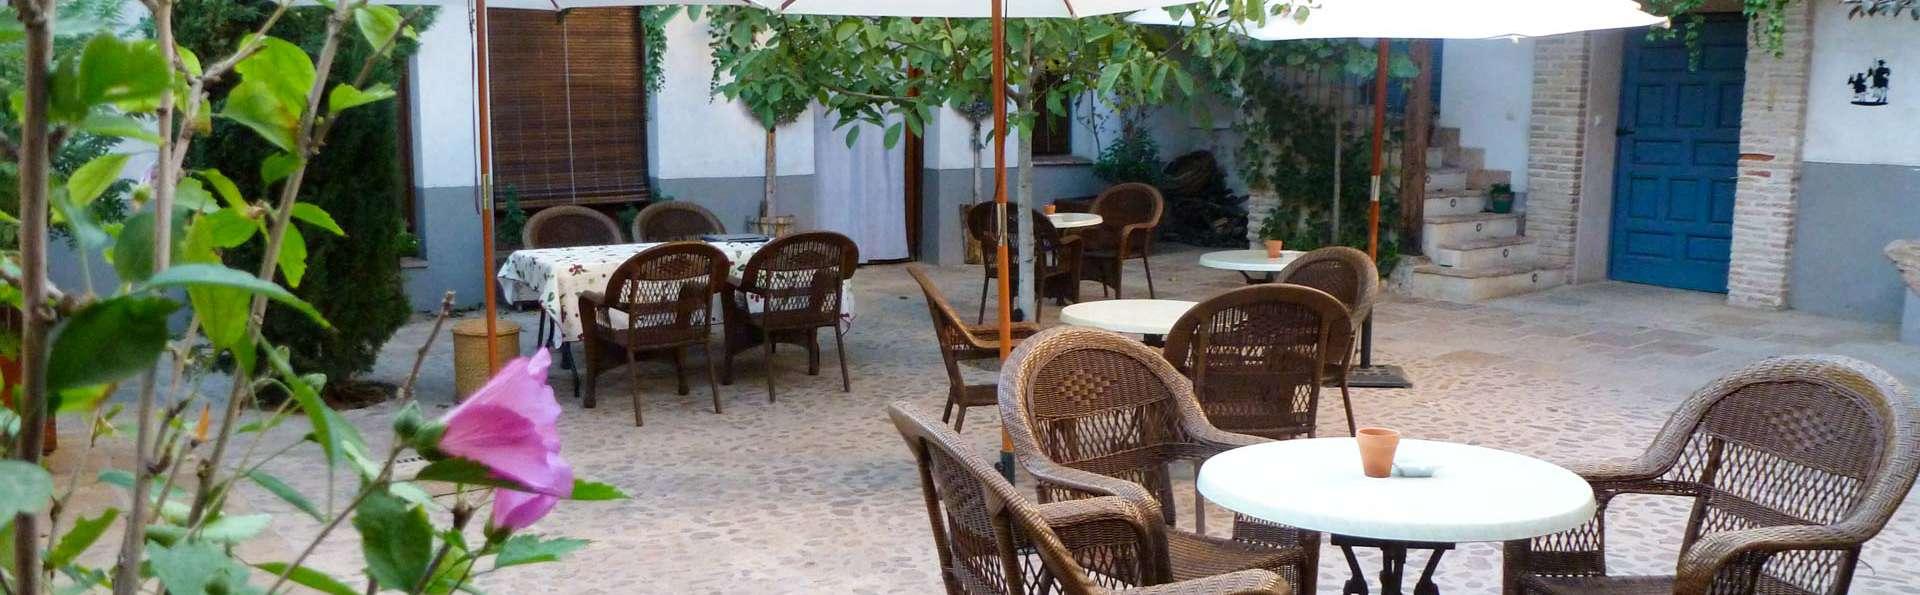 Hotel Rural La Vida de Antes - EDIT_N4_TERRACE.jpg